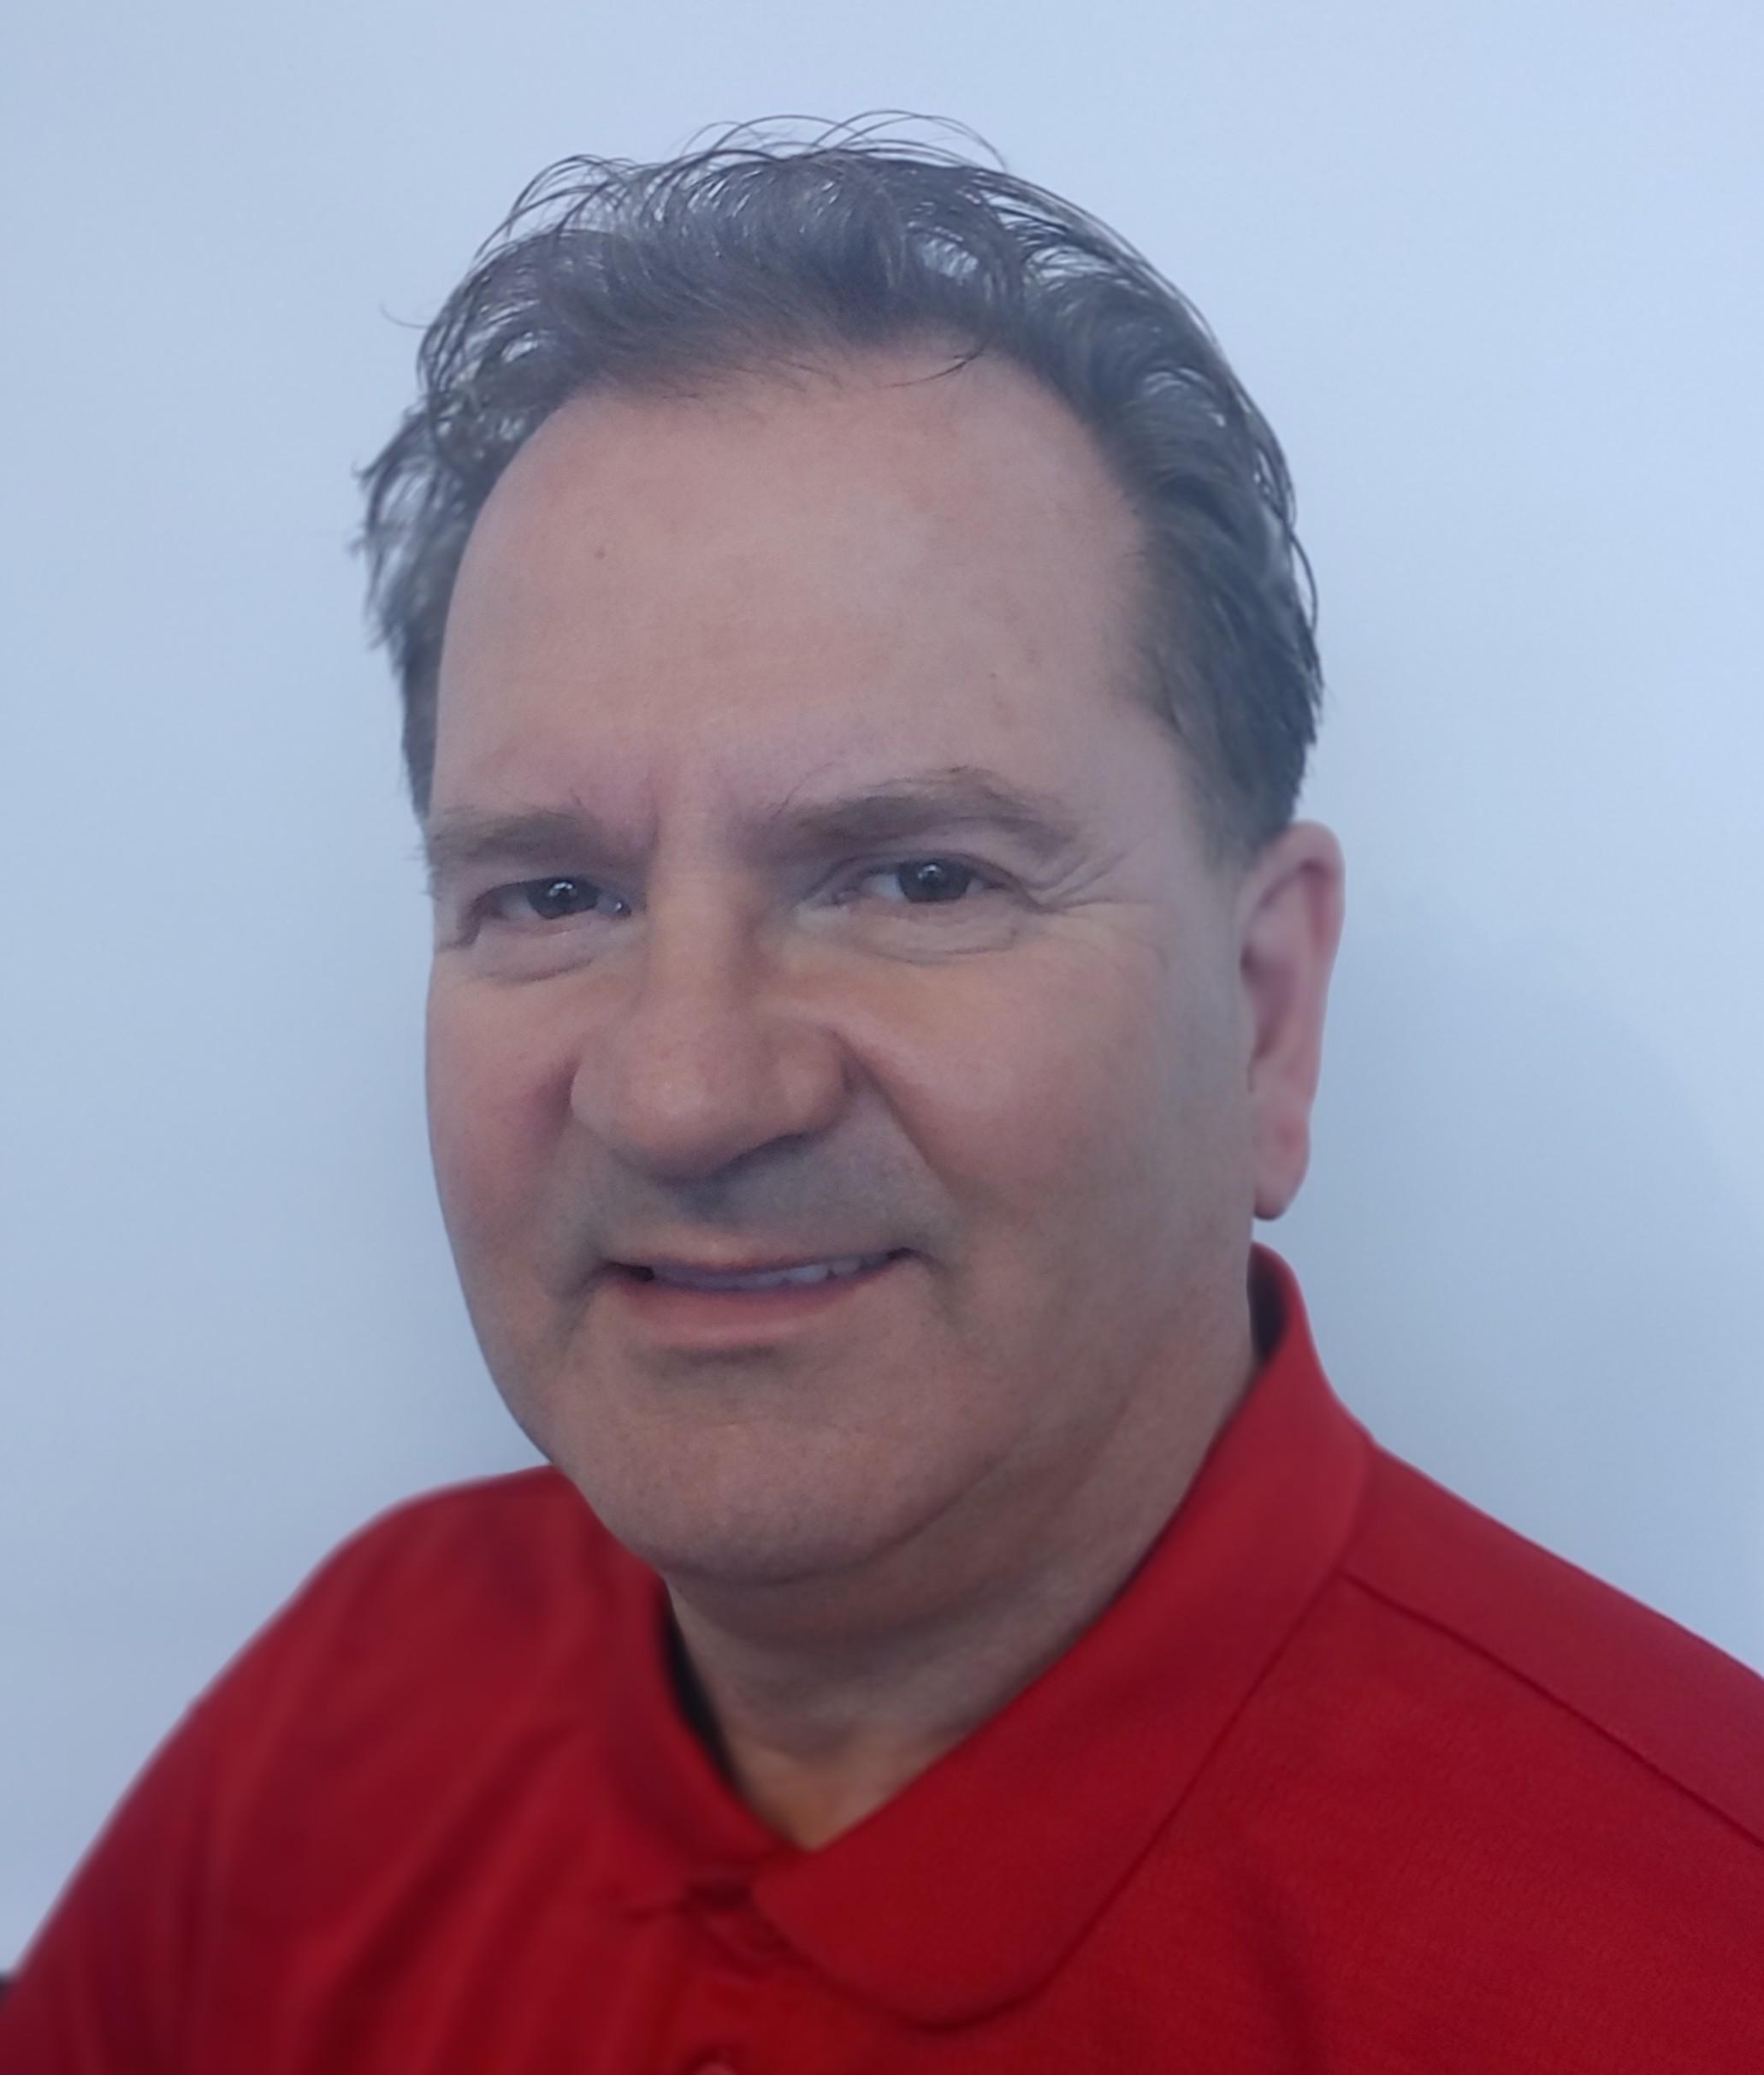 Pro Post Foundations Daniel Beauchamp